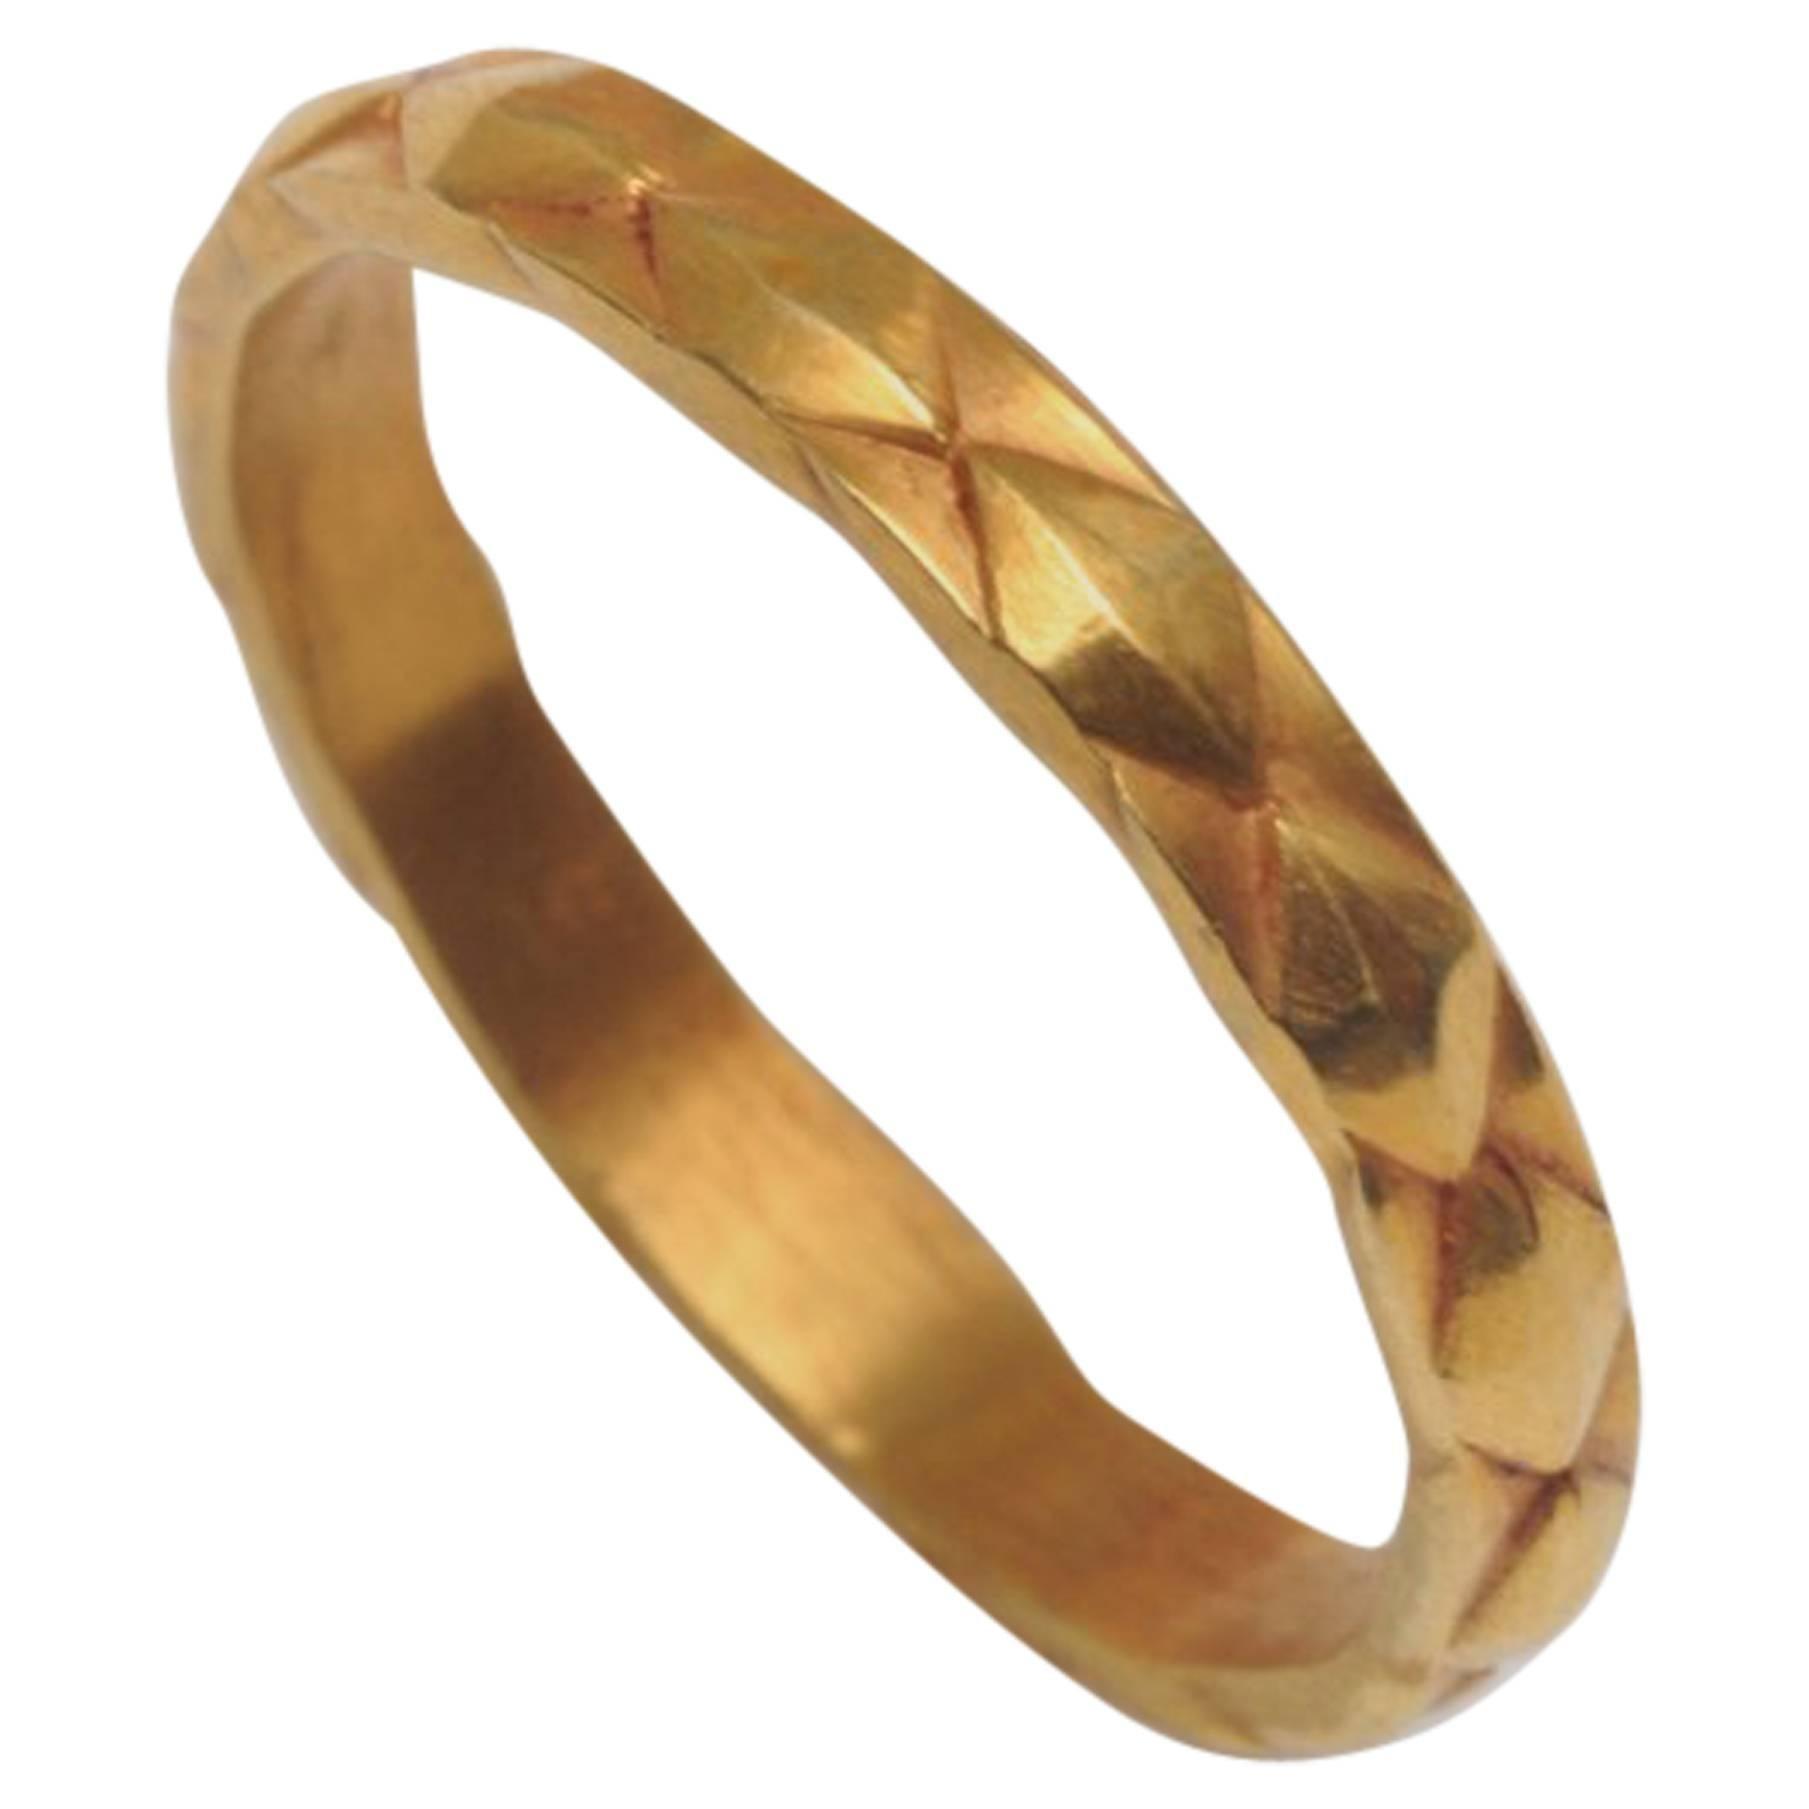 18 Karat Gold Textured Band